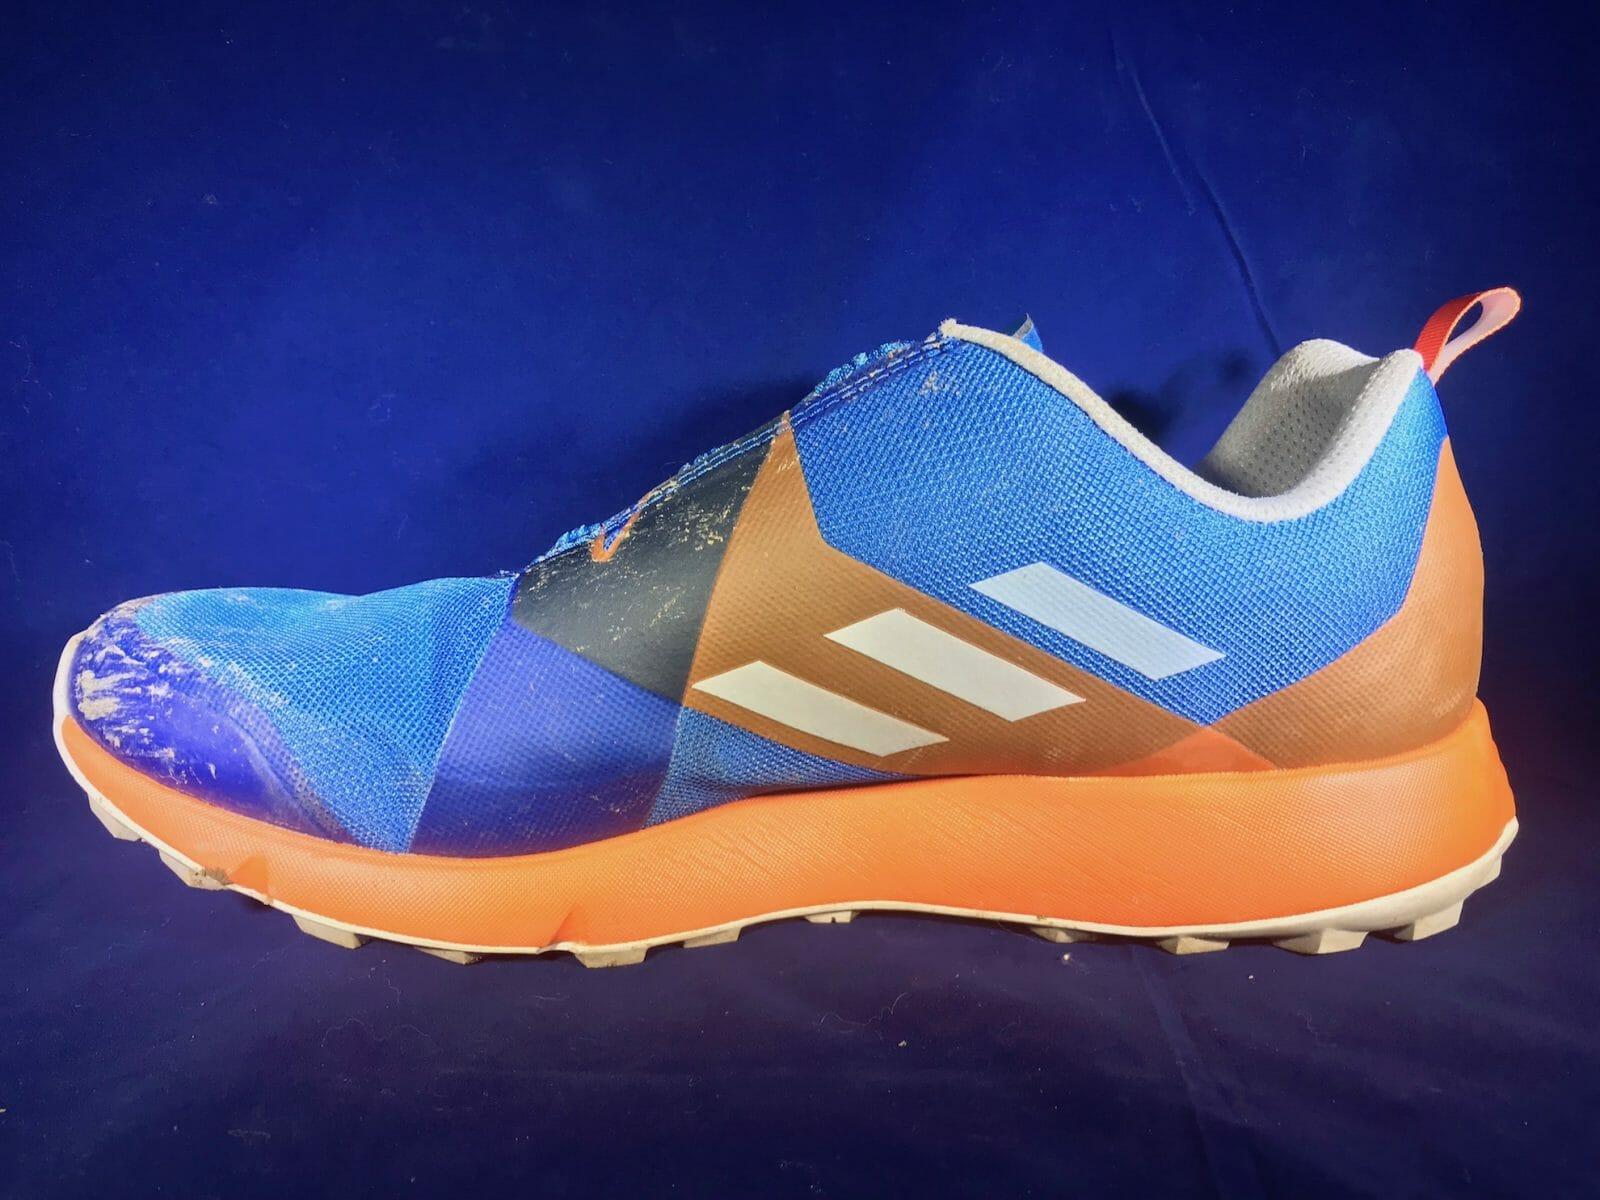 6b5f6cea5d33 Adidas Terrex Two Boa - pair. All photos (6). Men s ...